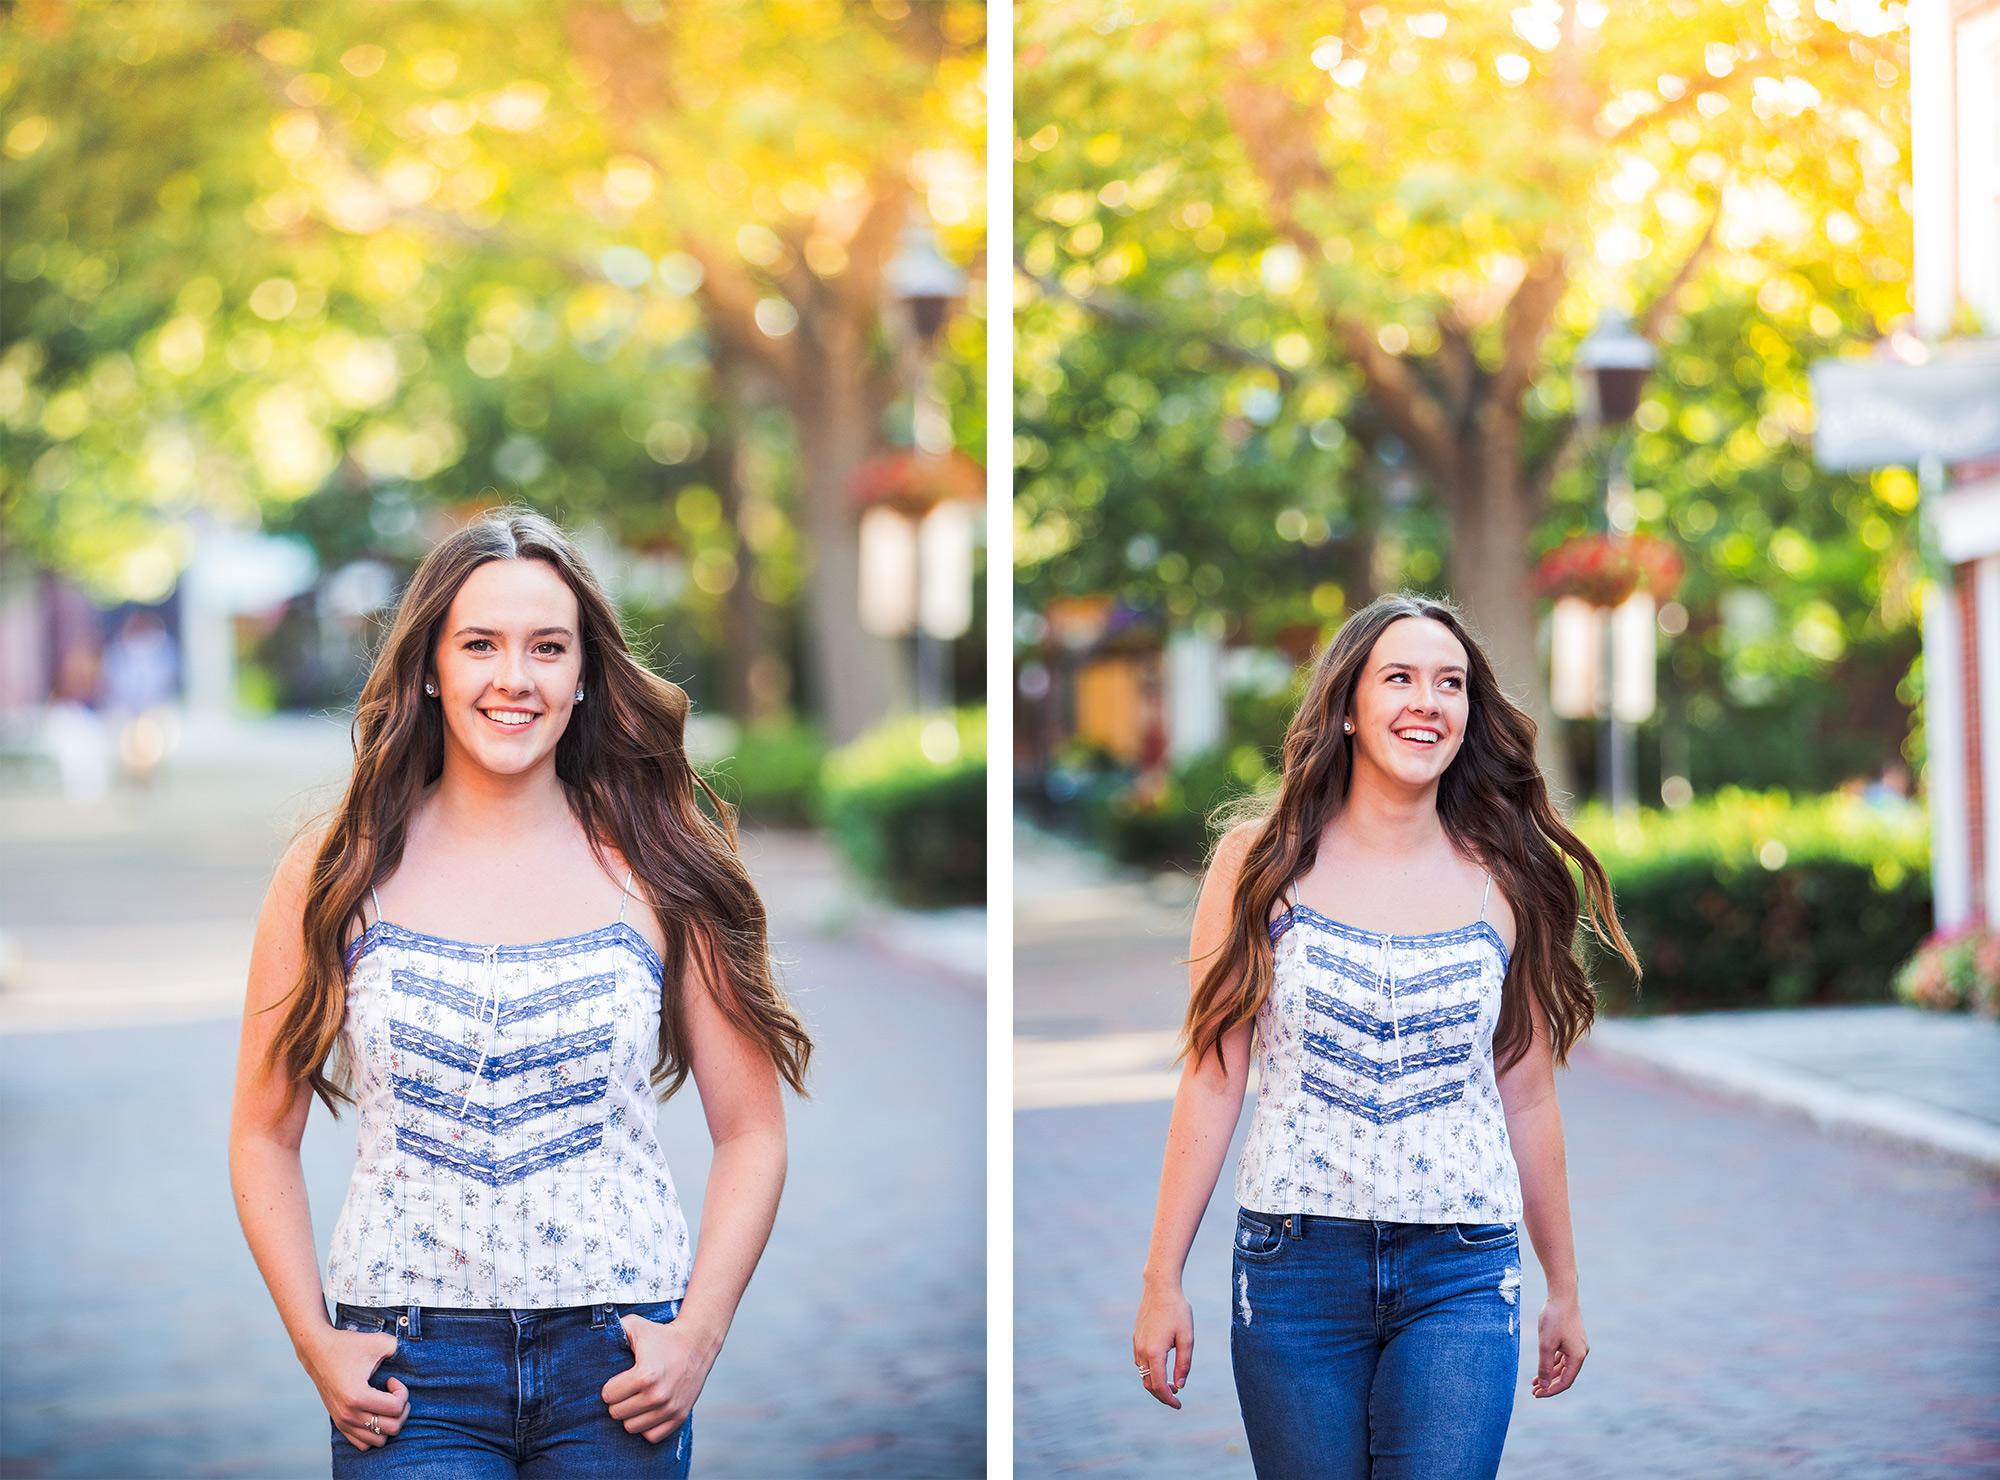 Boston Senior Portrait Photographer | Stephen Grant Photography